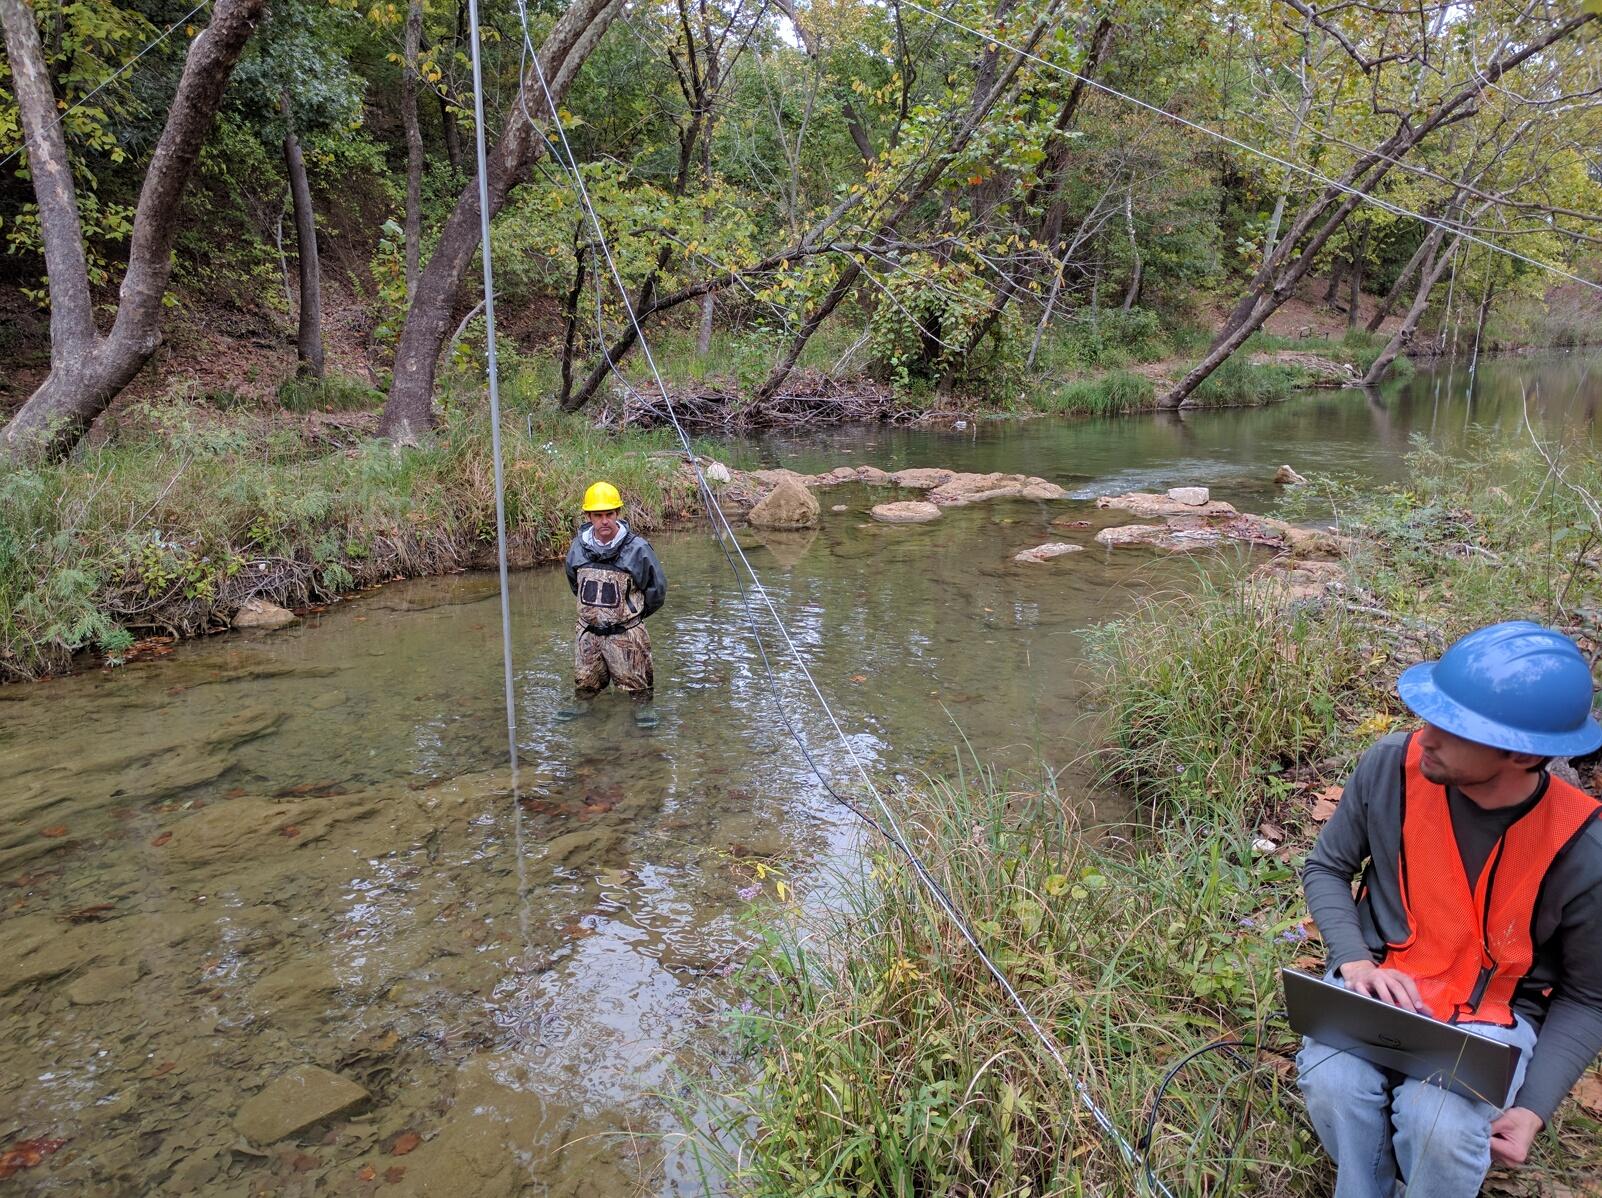 Researchers positioning stream radar above Honey Creek in Davis, Oklahoma. Credit: J.J. Gourley/ NOAA